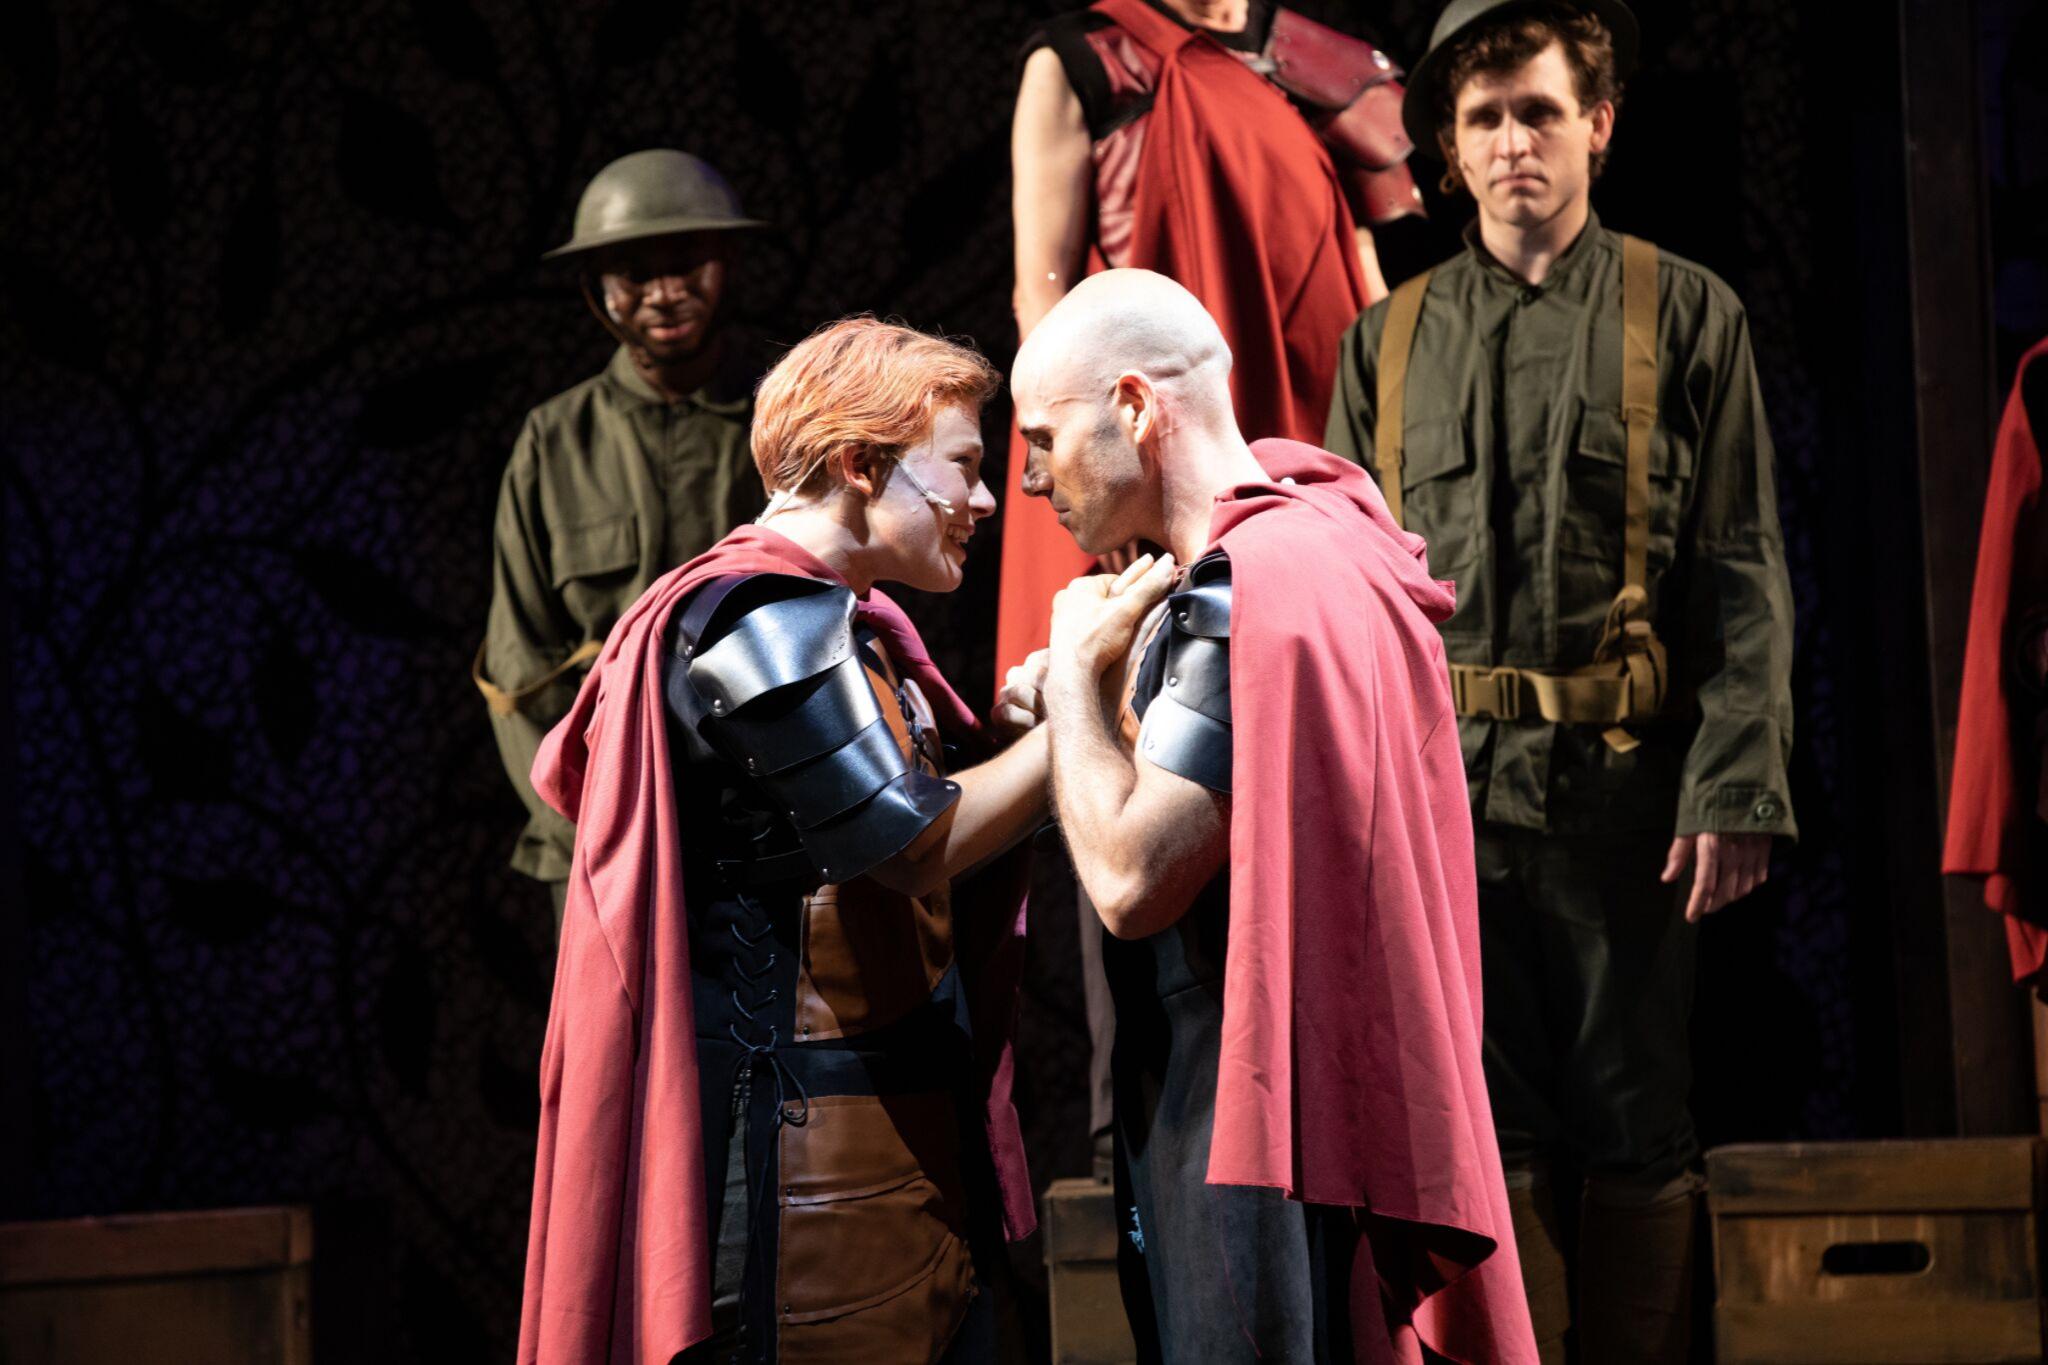 Nigel Richards (Soldier), Nora Eschenheimer (Imogen), Daniel Duque-Estrada (Posthumus) and John Hardin (Soldier) in Cymbeline, Shakespeare on the Common 2019-Photo by Evgenia Eliseeva